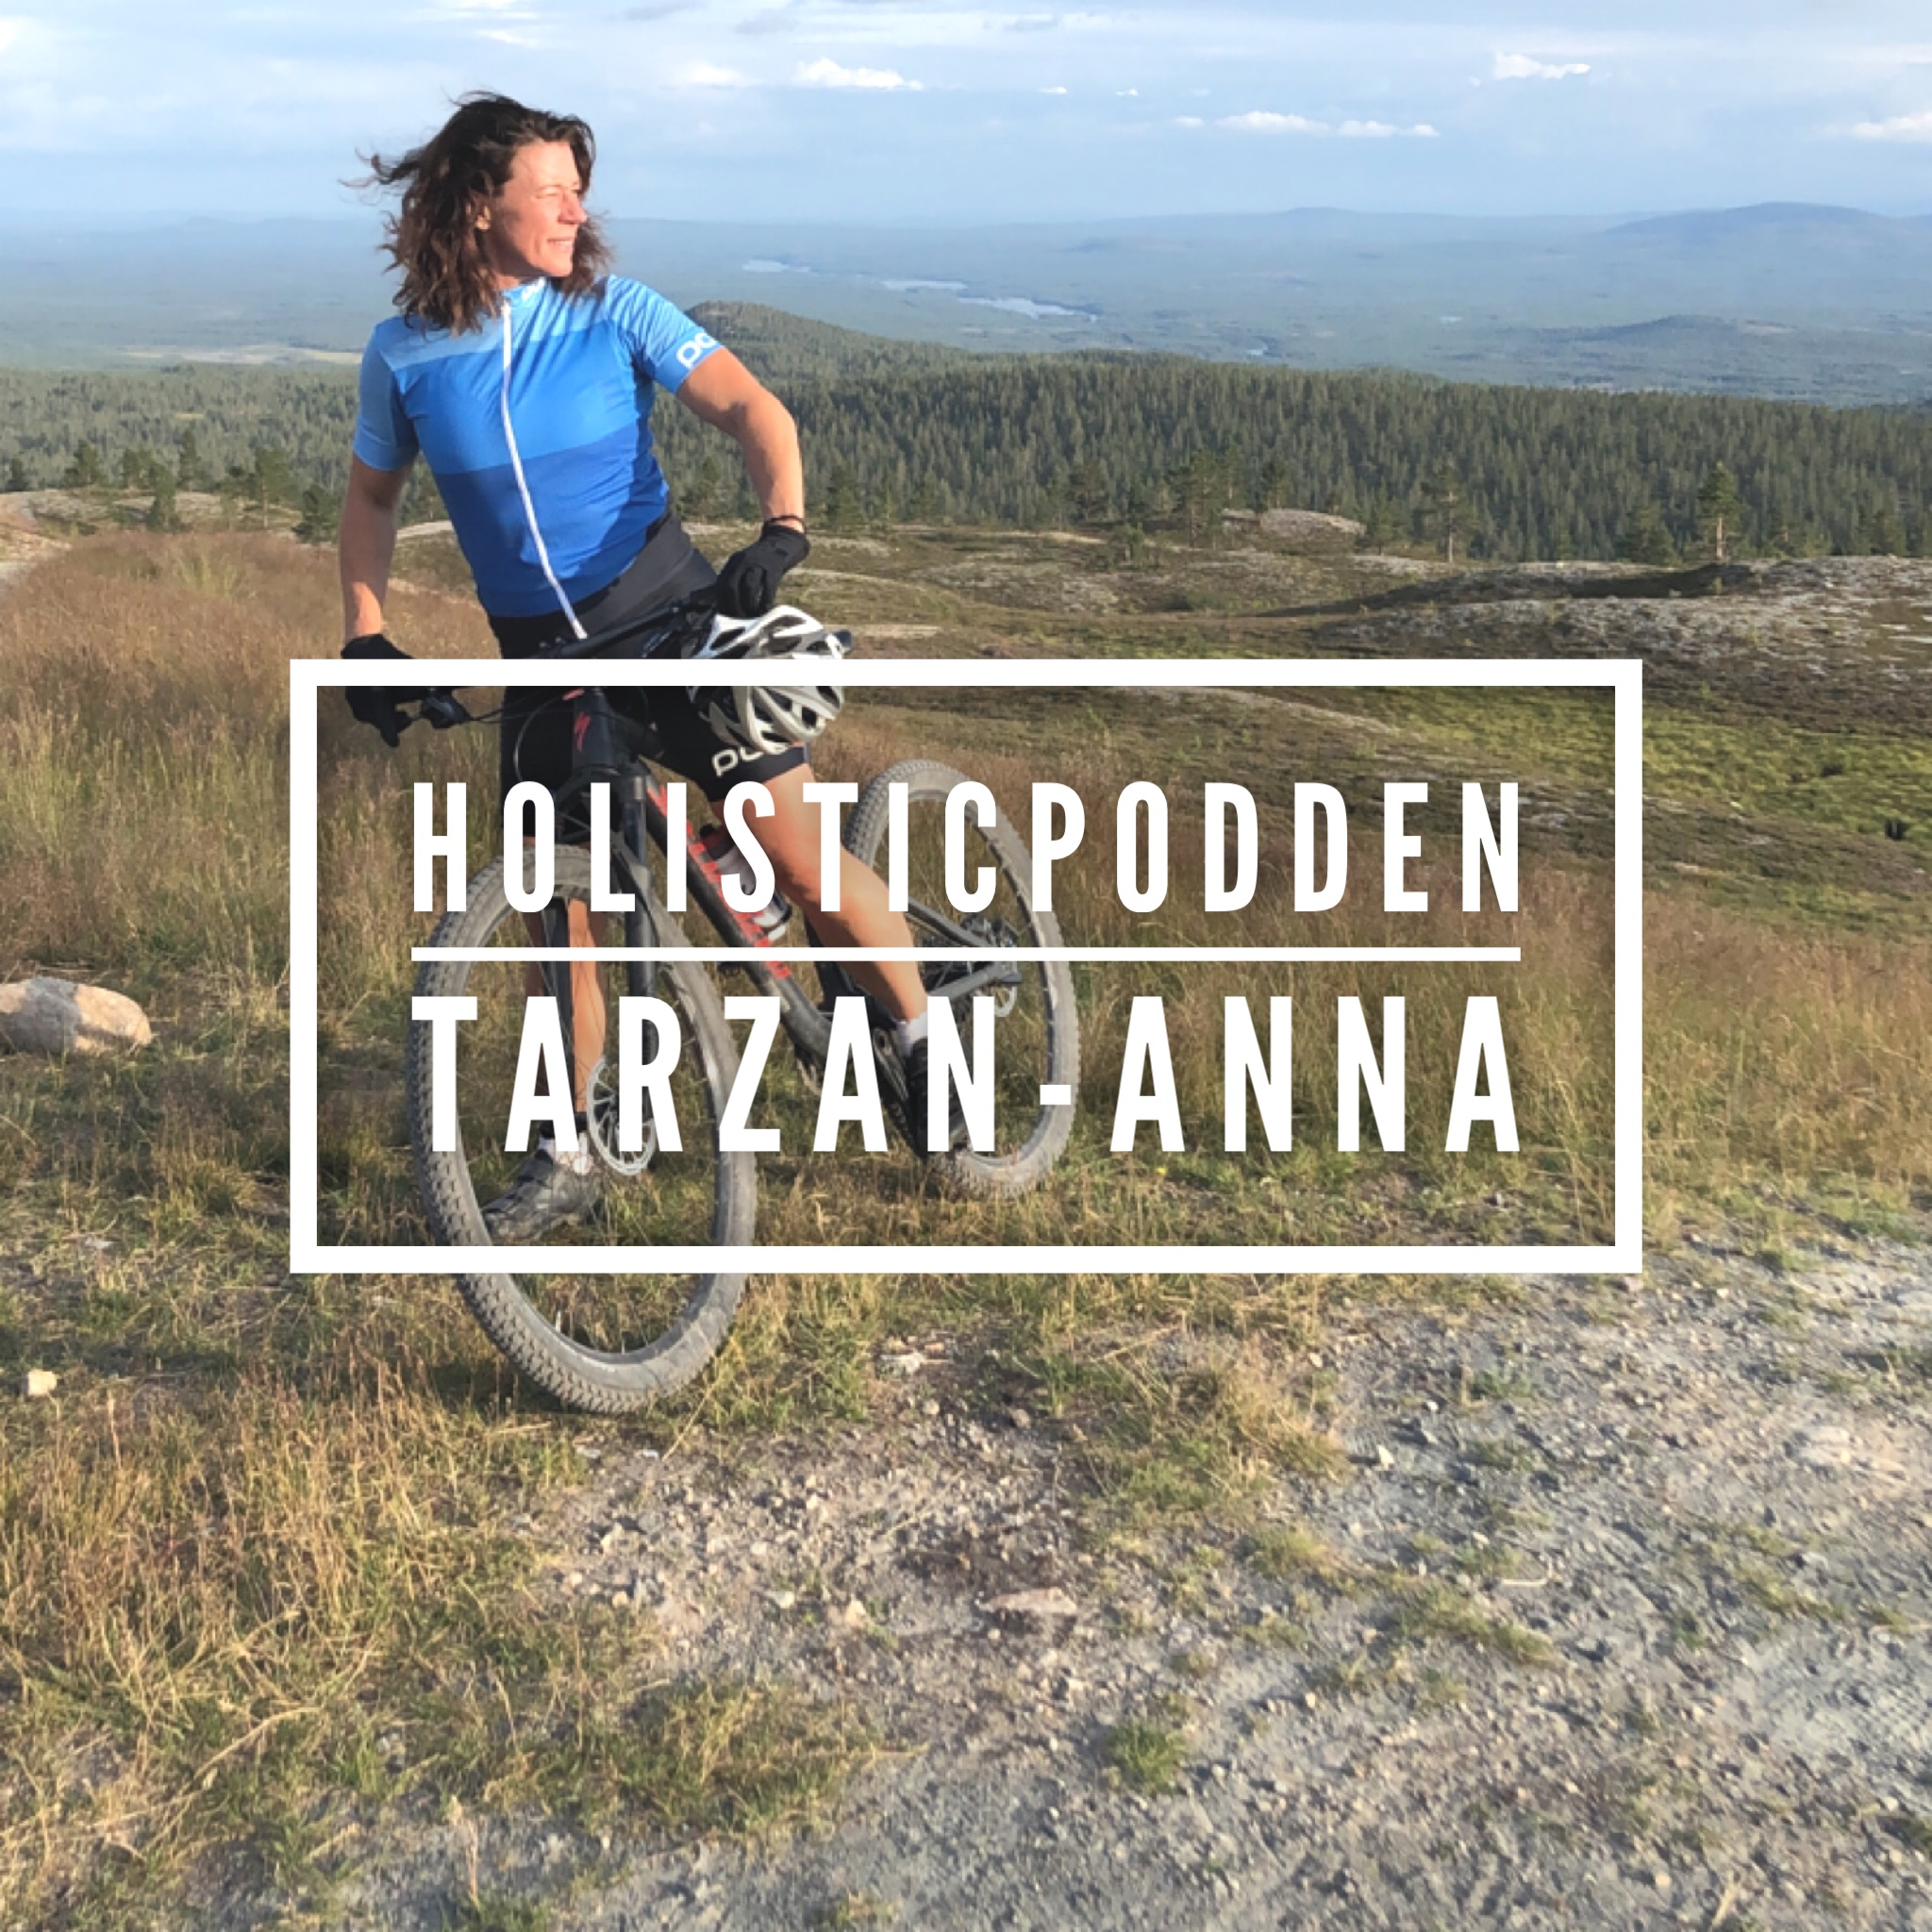 Holisticpodden